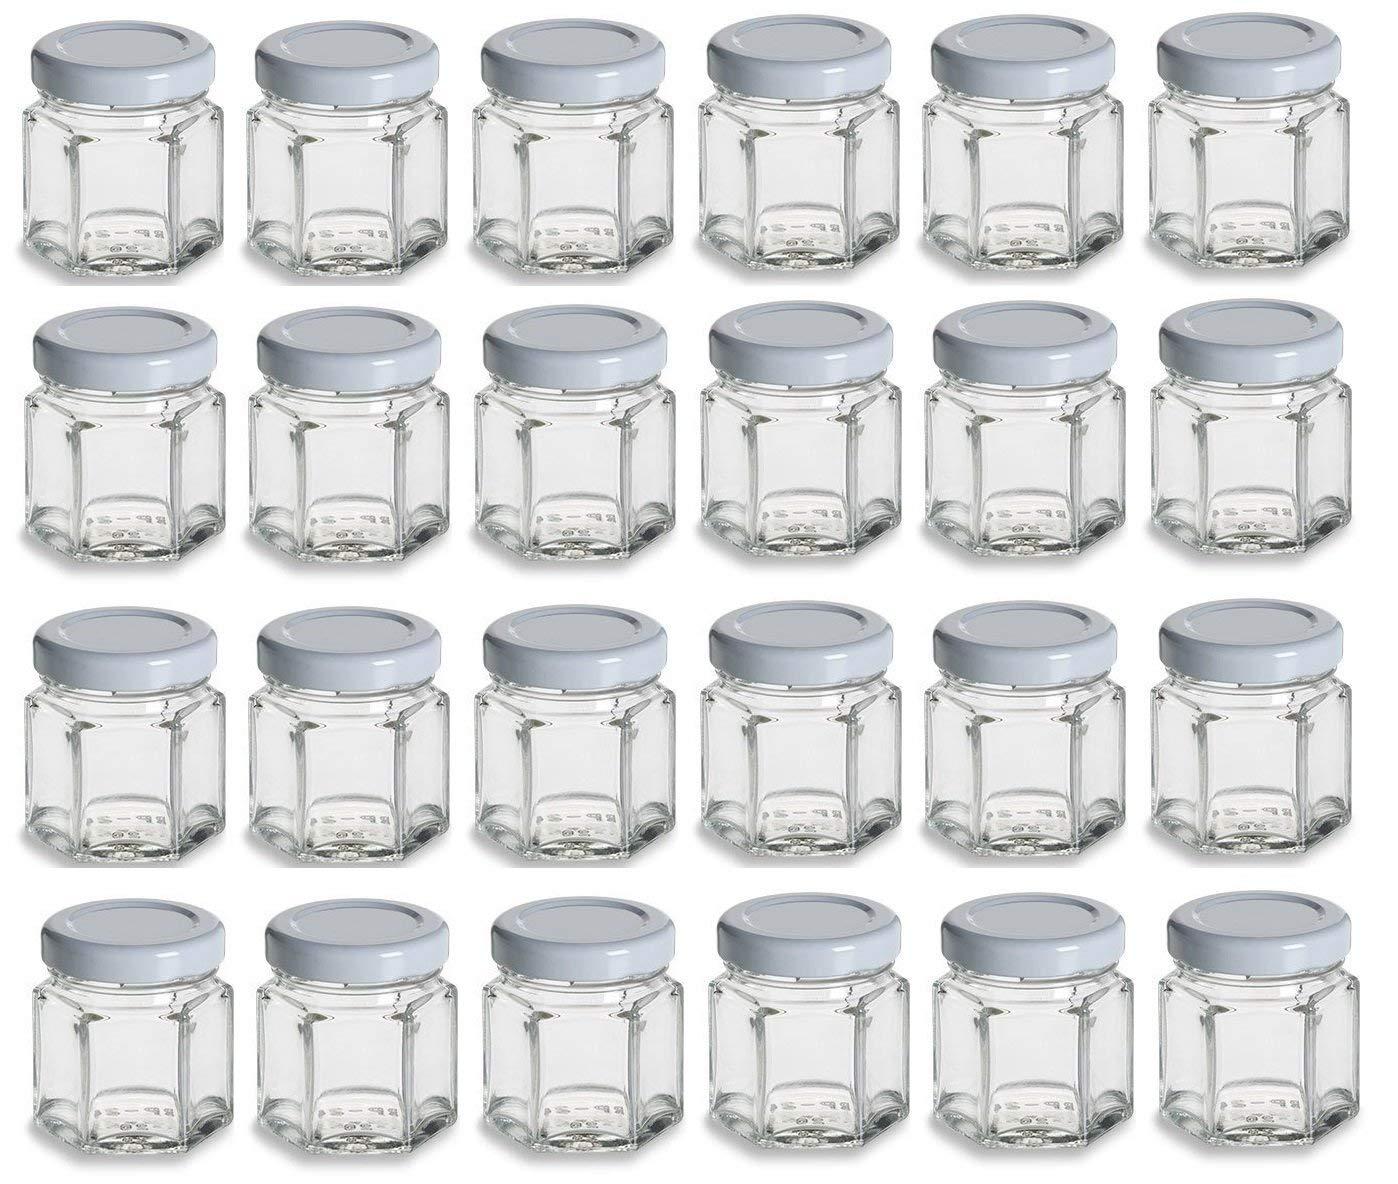 Nakpunar 1.5 oz Mini Hexagon Glass Jars with White Plastisol Lined Lids - Set of 24 - Value Pack